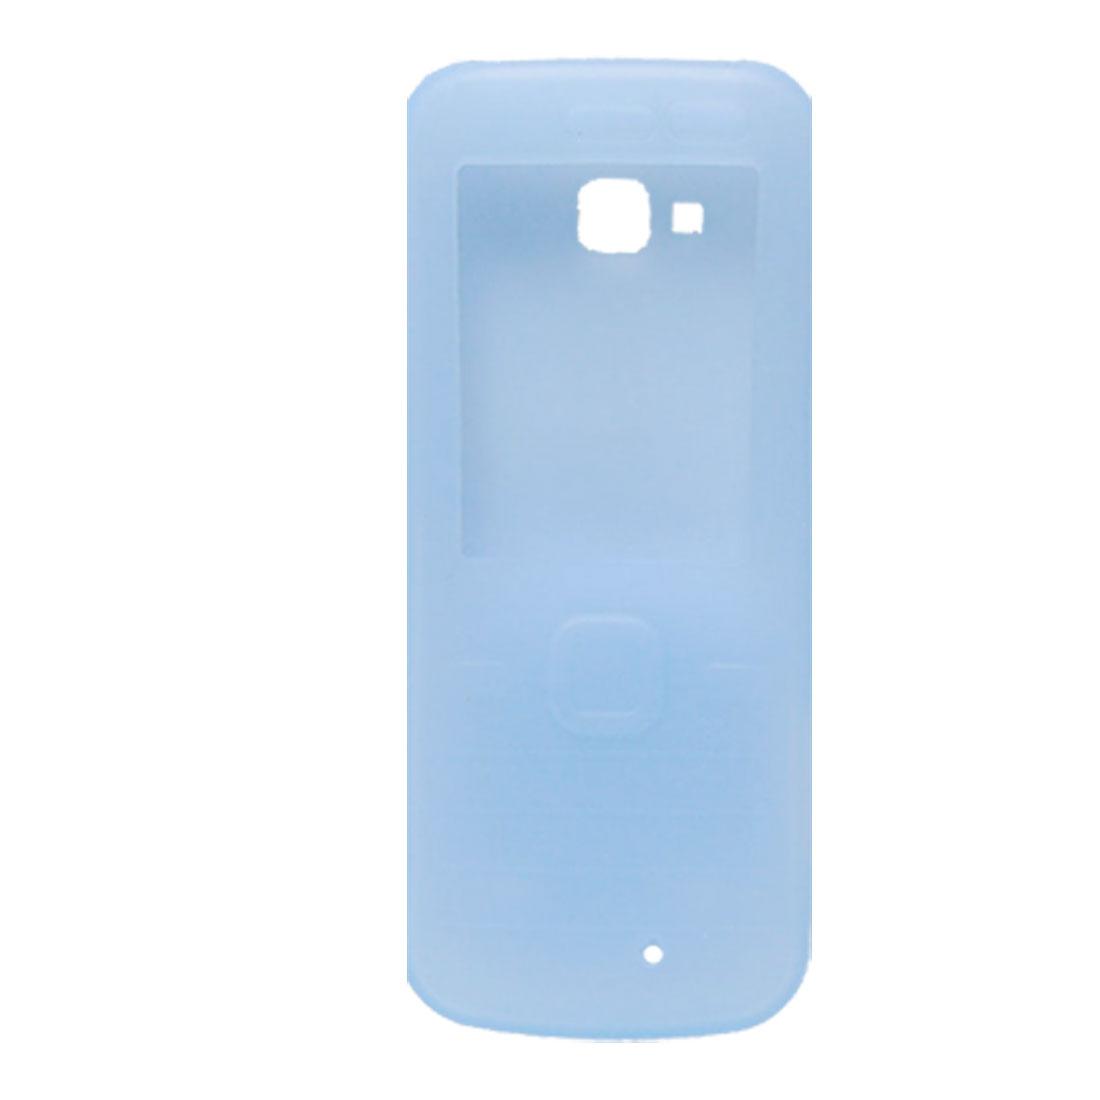 Light Blue Soft Smooth Silicone Cover for Nokia 6730